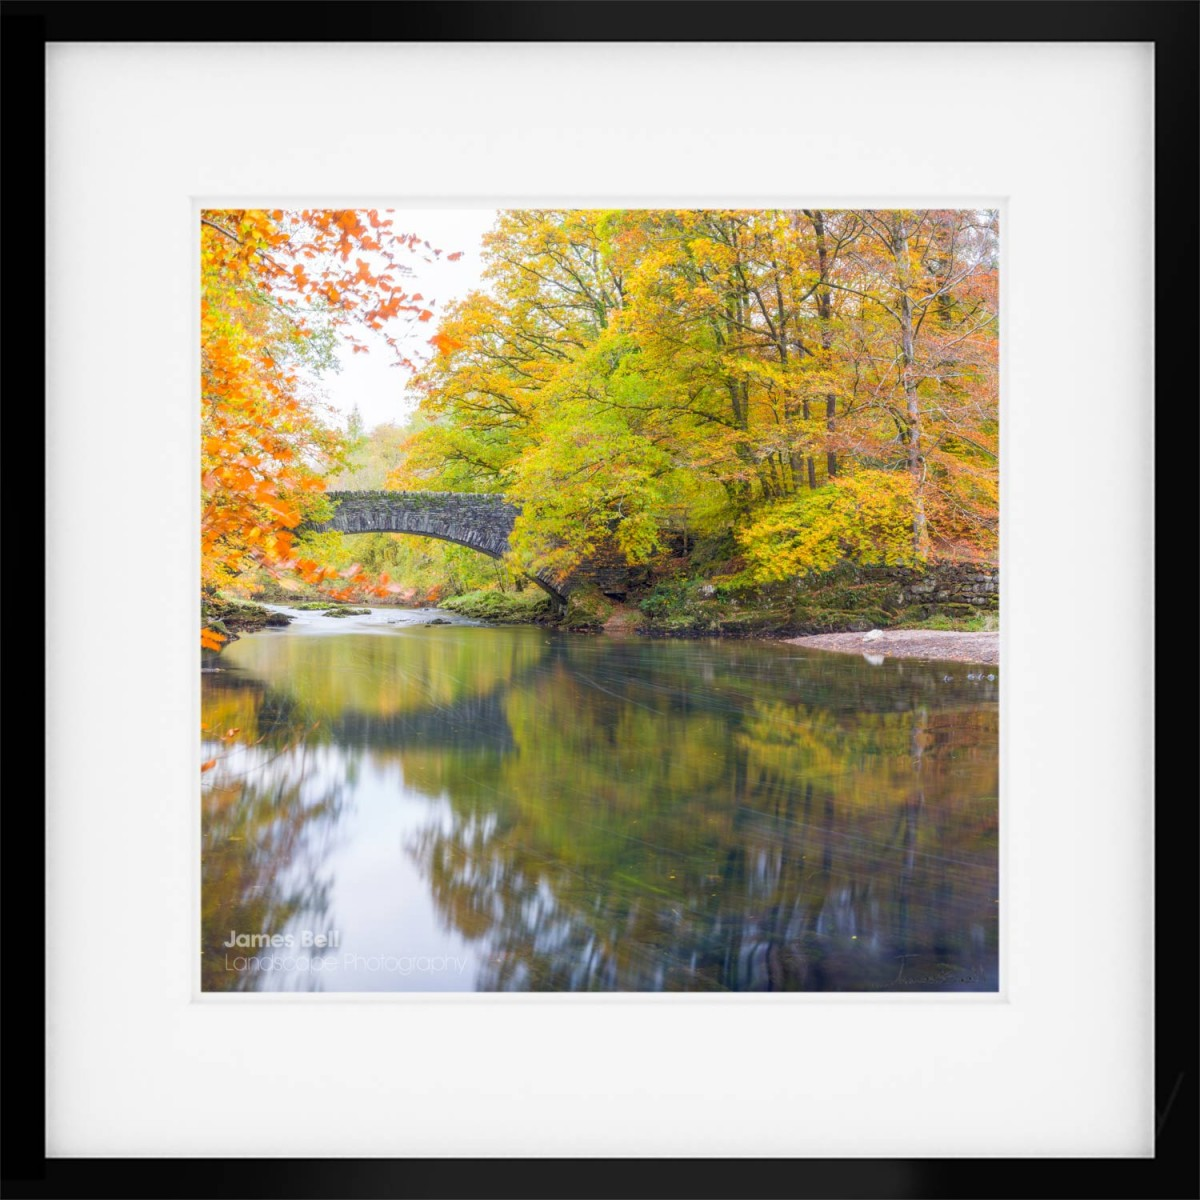 clappersgate bridge autumn framed print